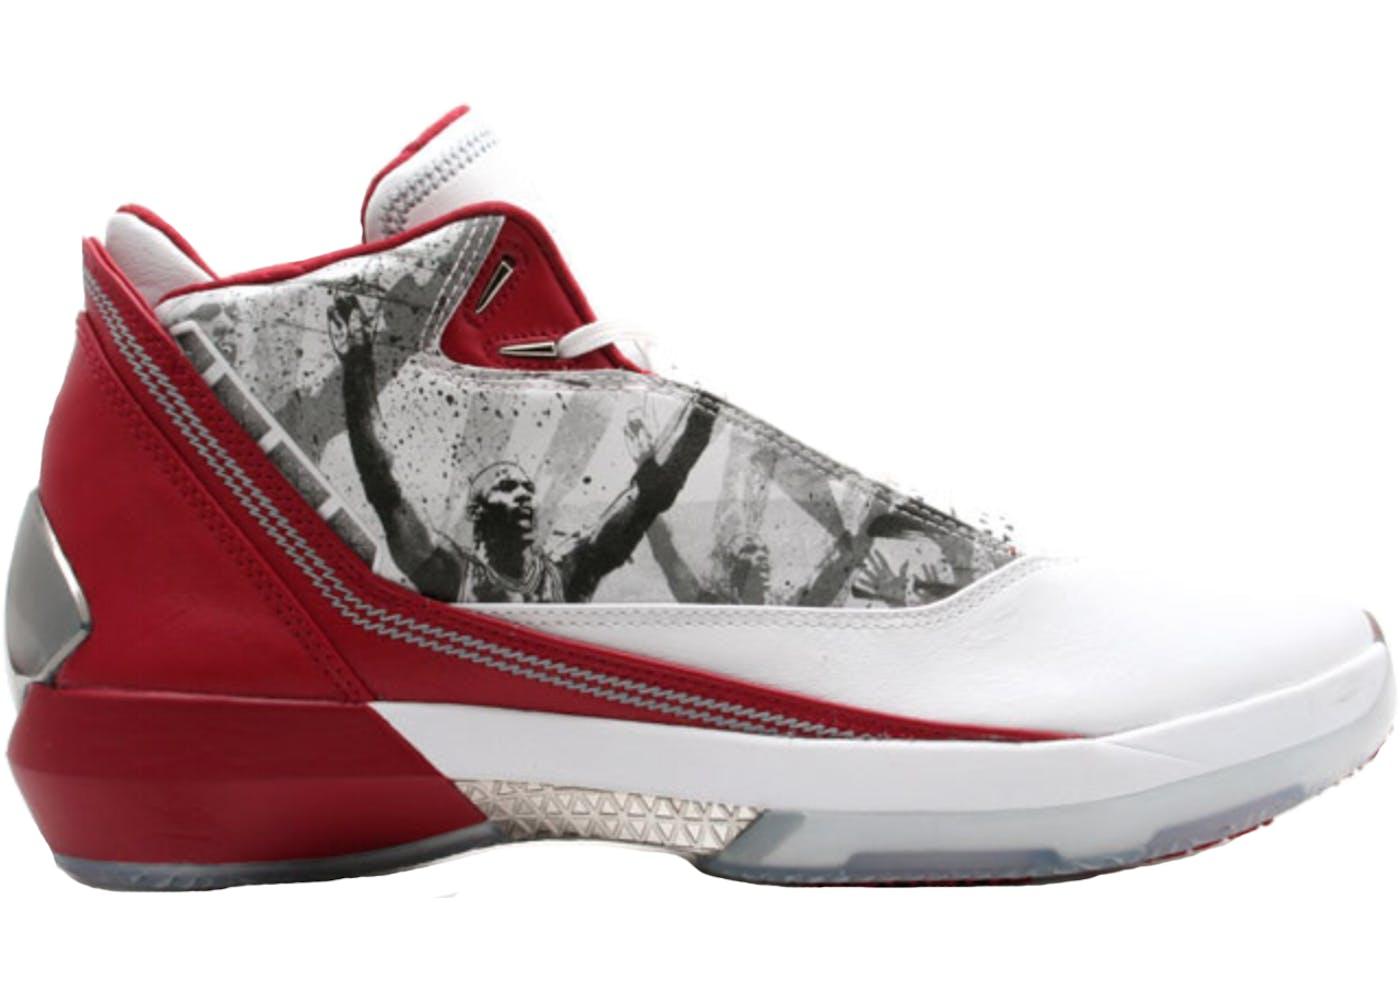 size 40 93a1c b1c28 ... 315299 001 - blackvarsity red . jordan collezione 221 air-jordan-XXII-shoe-01  ... Jordan 22 OG Omega ...